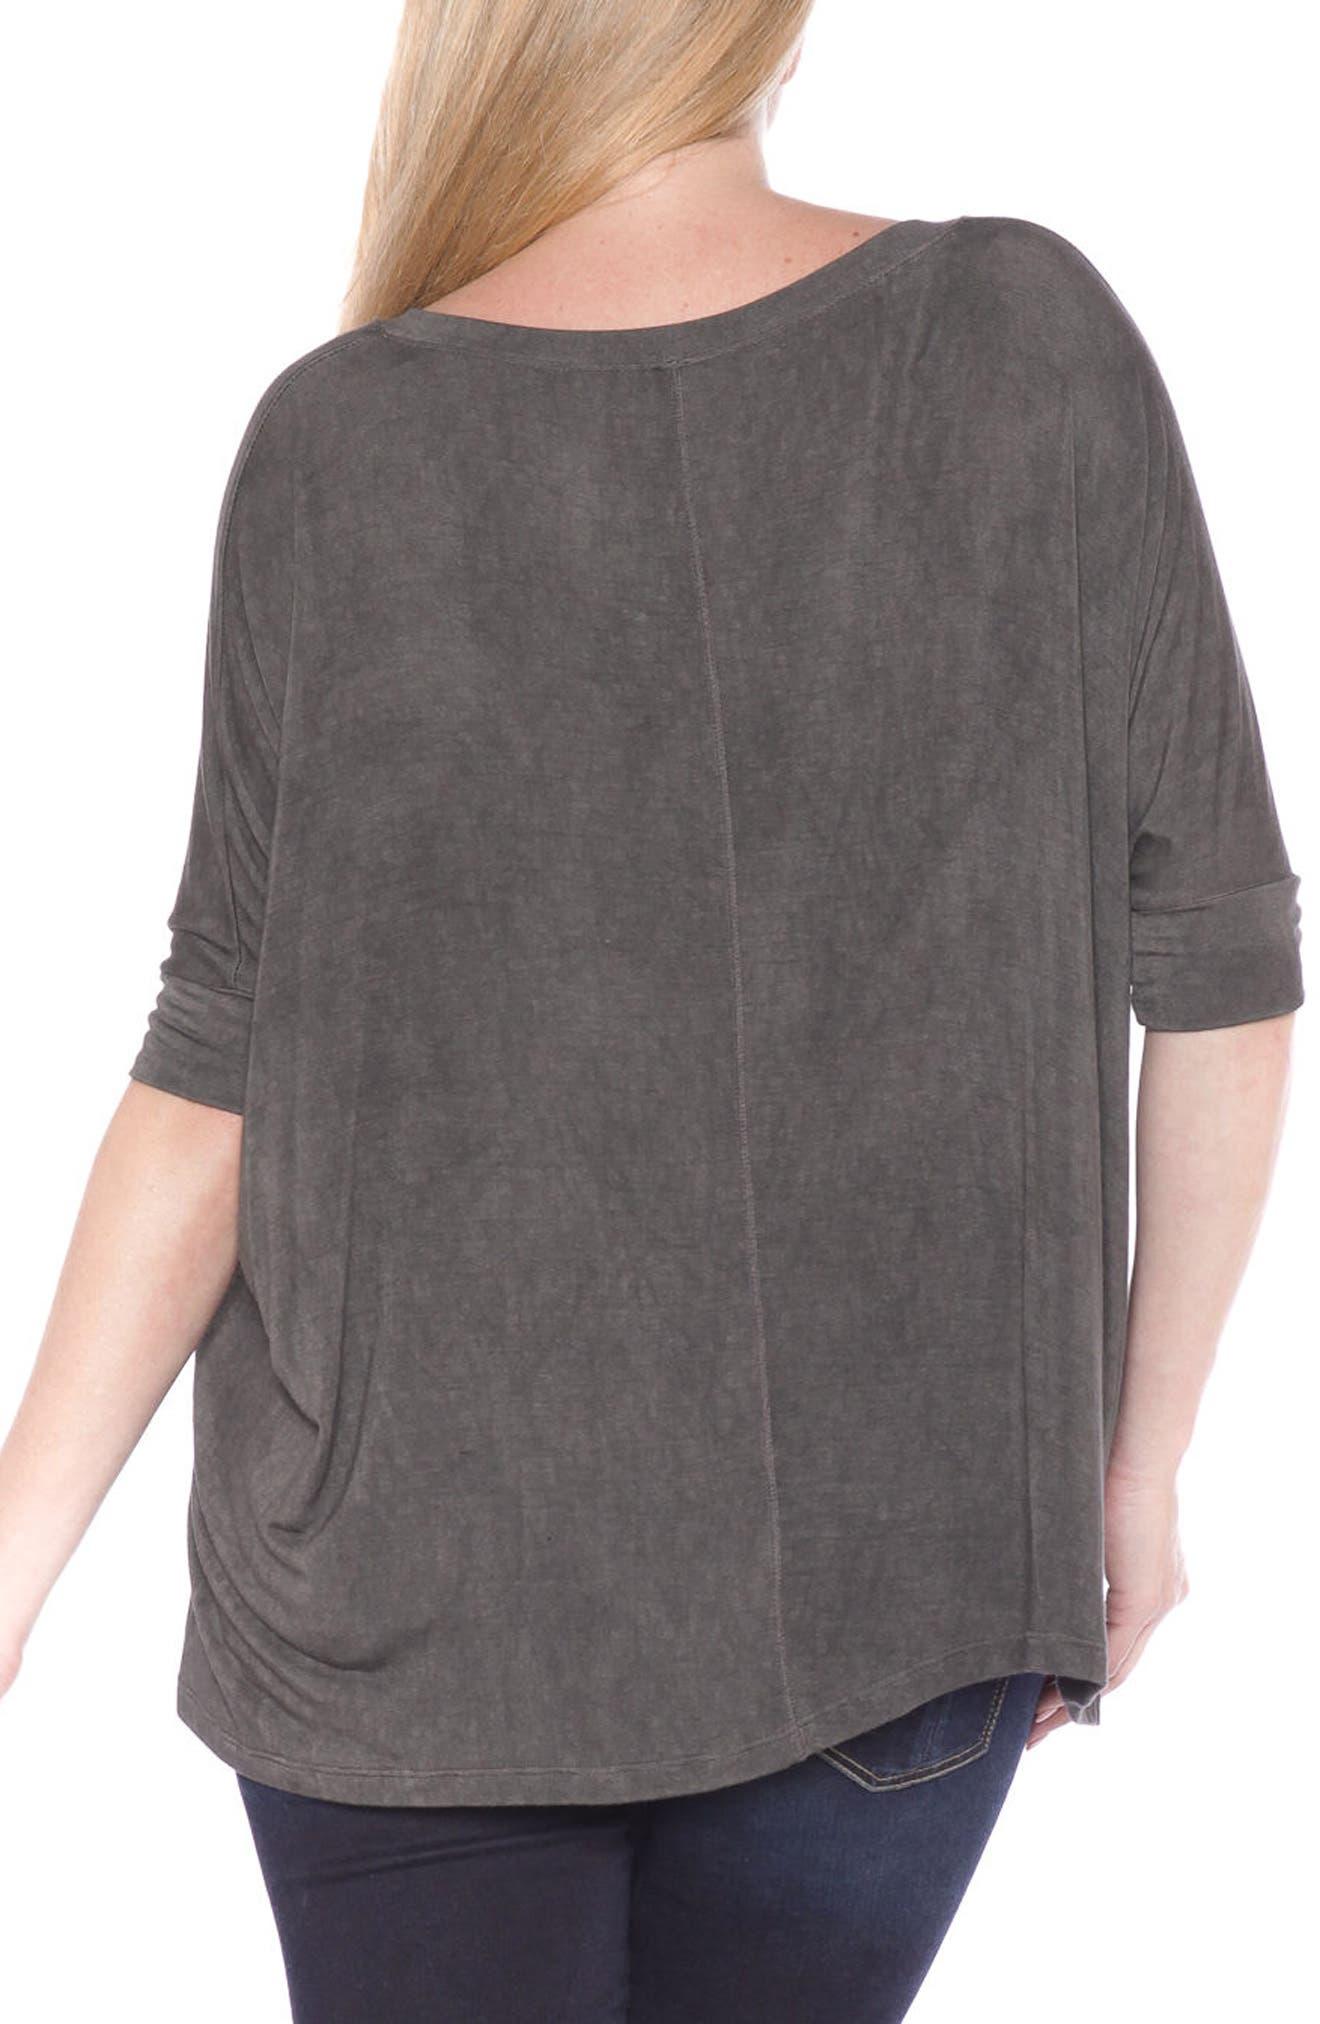 Dolman Sleeve Top,                             Alternate thumbnail 2, color,                             001